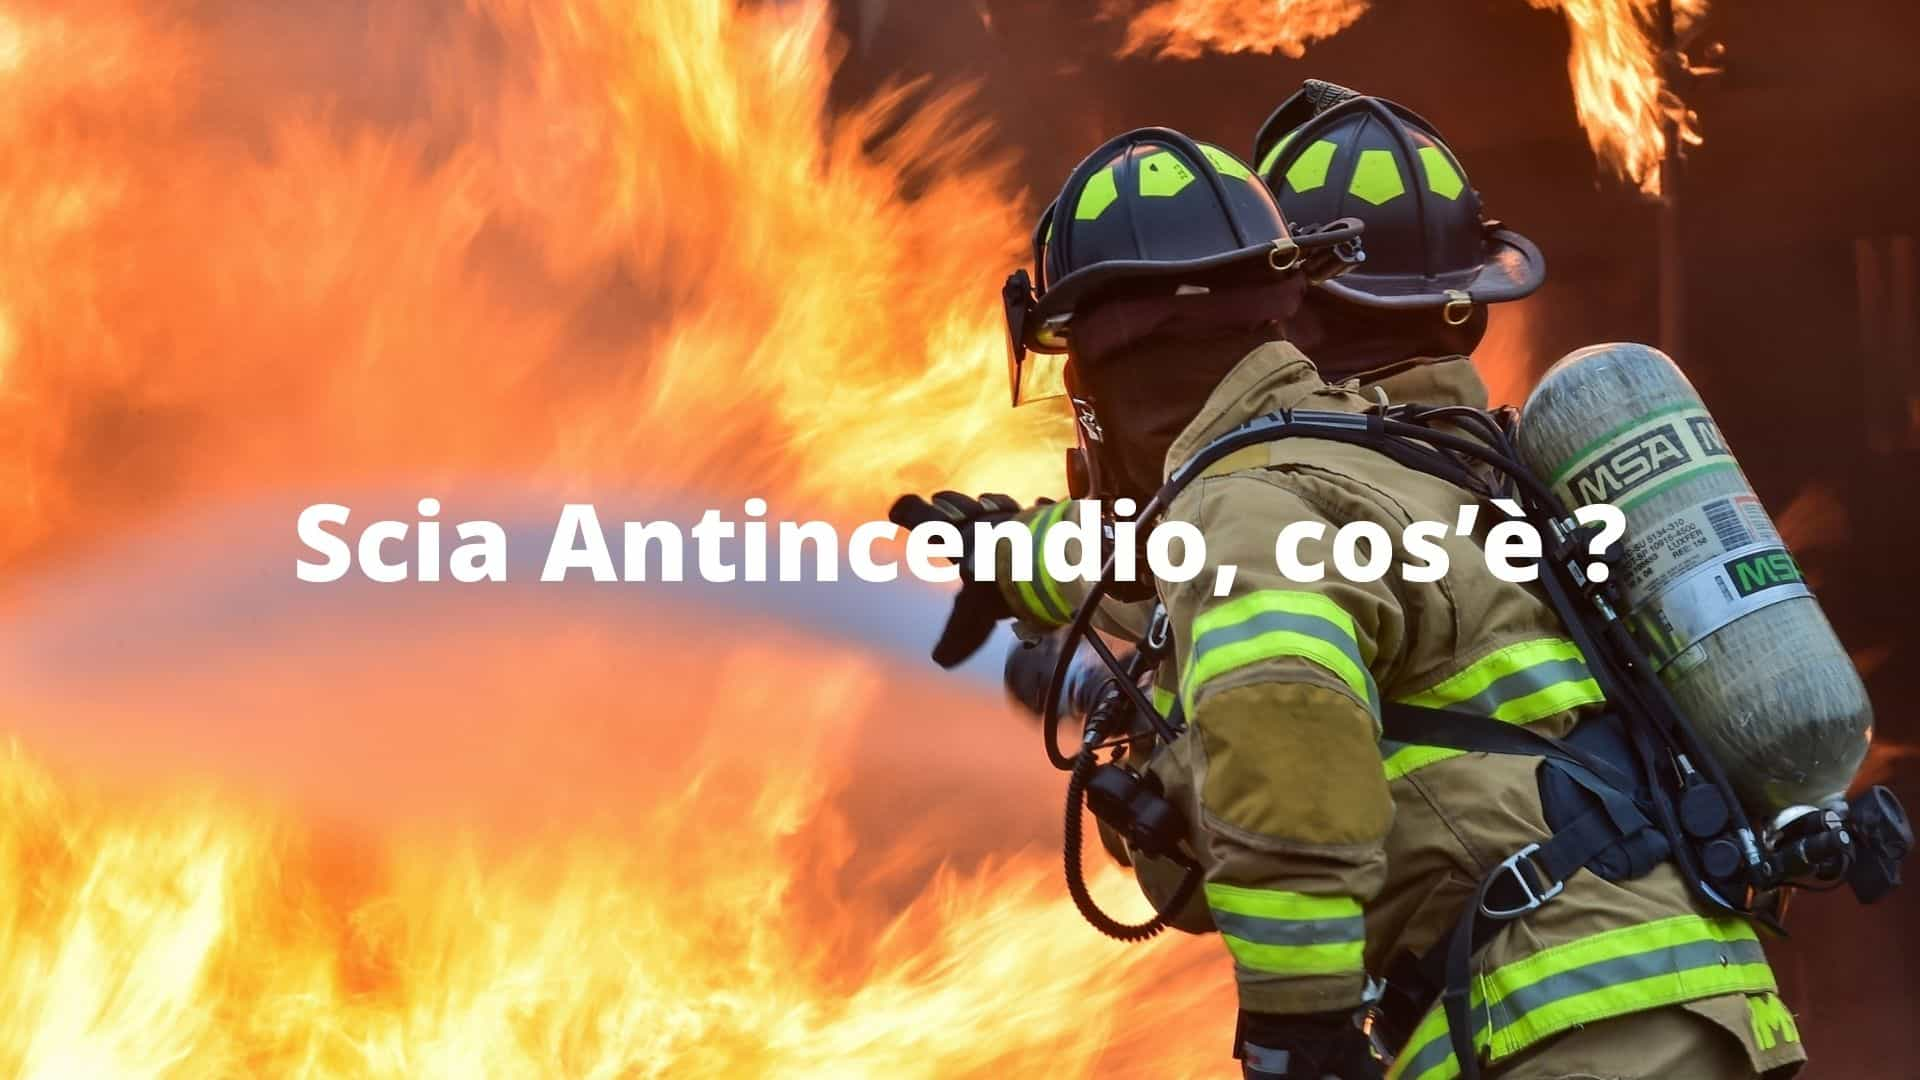 Scia Antincendio